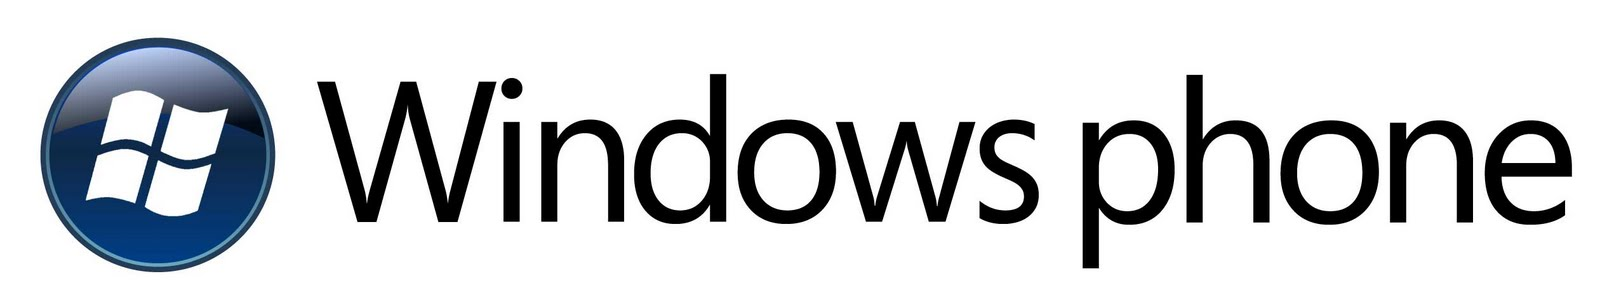 windows_phone_logo.jpg